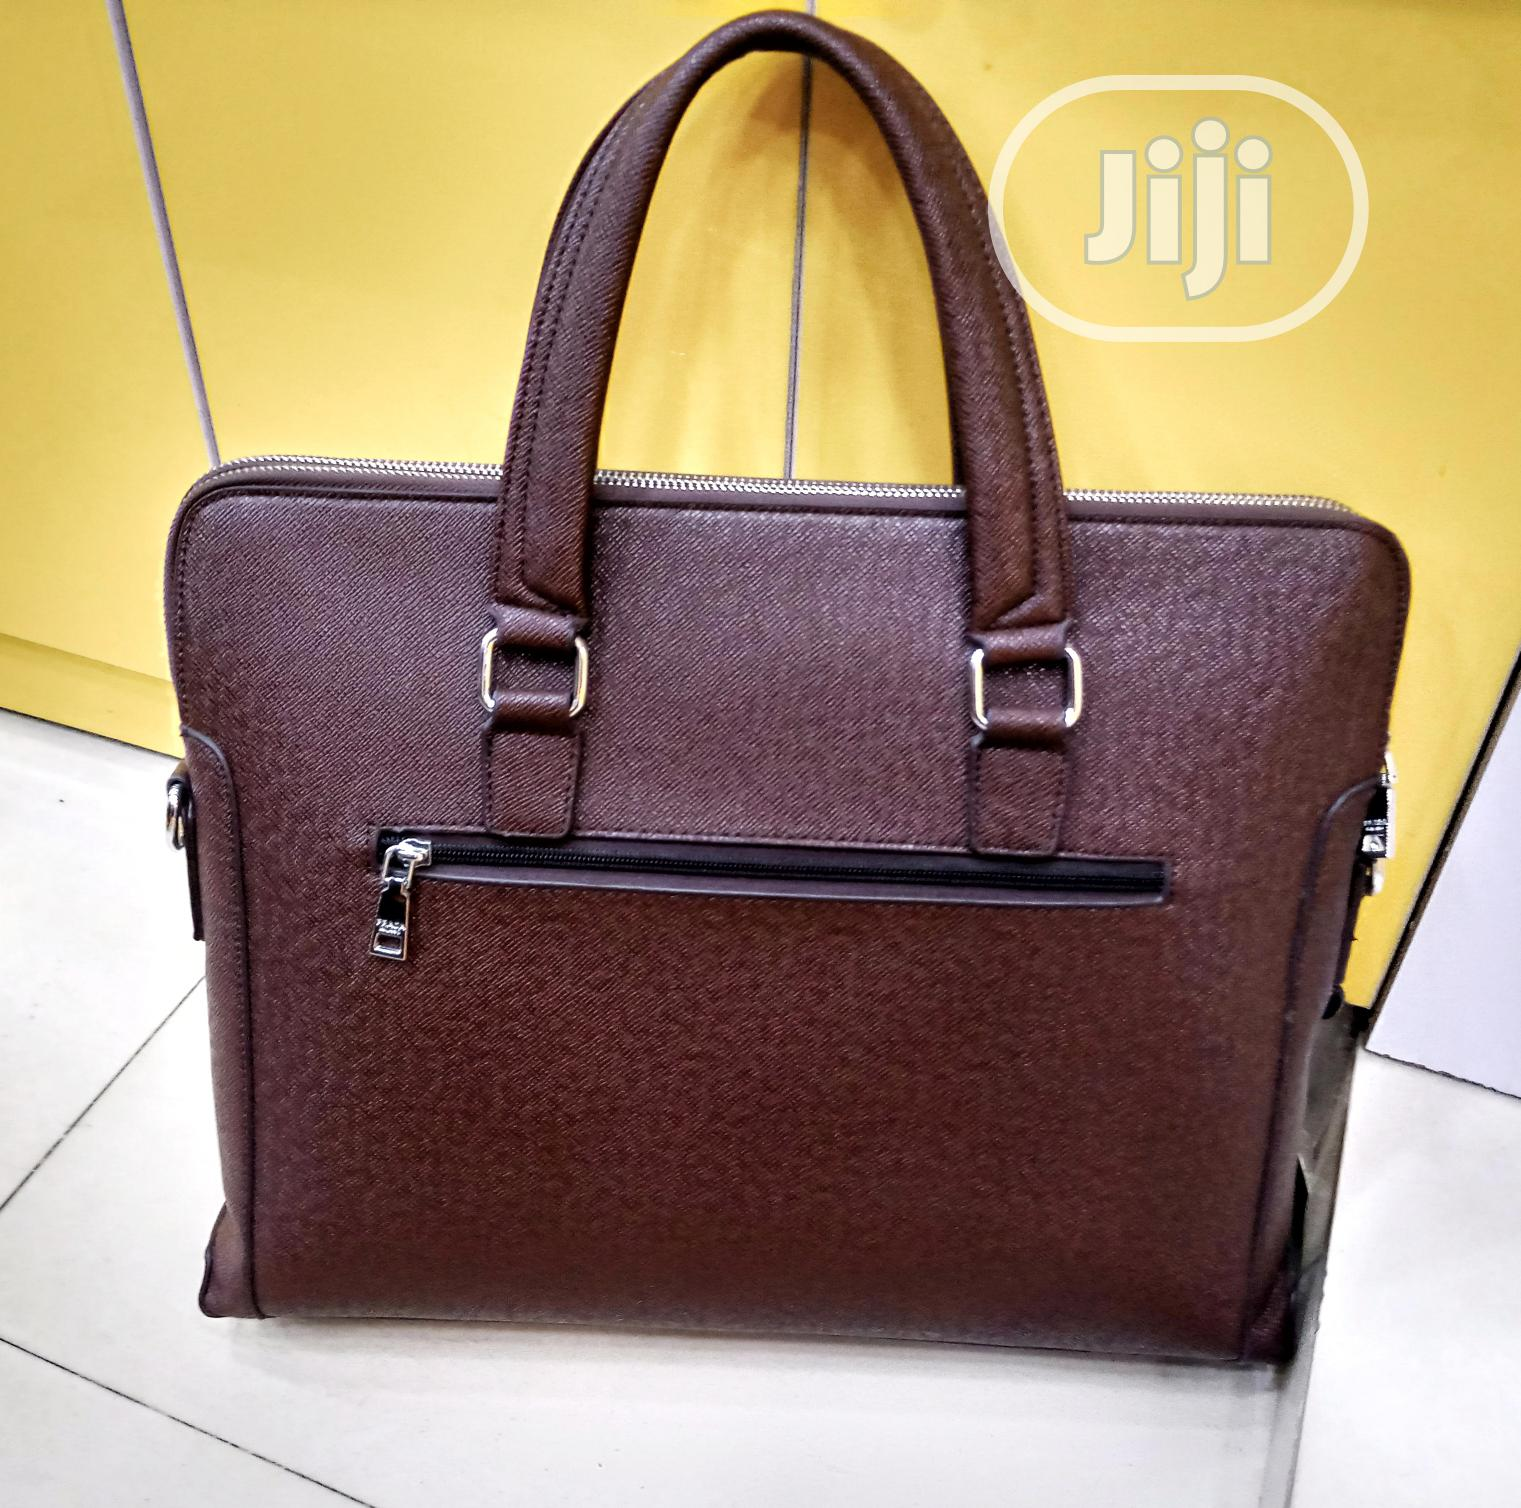 Brown Leather Prada Designer Mens Handbag | Bags for sale in Lagos Island, Lagos State, Nigeria